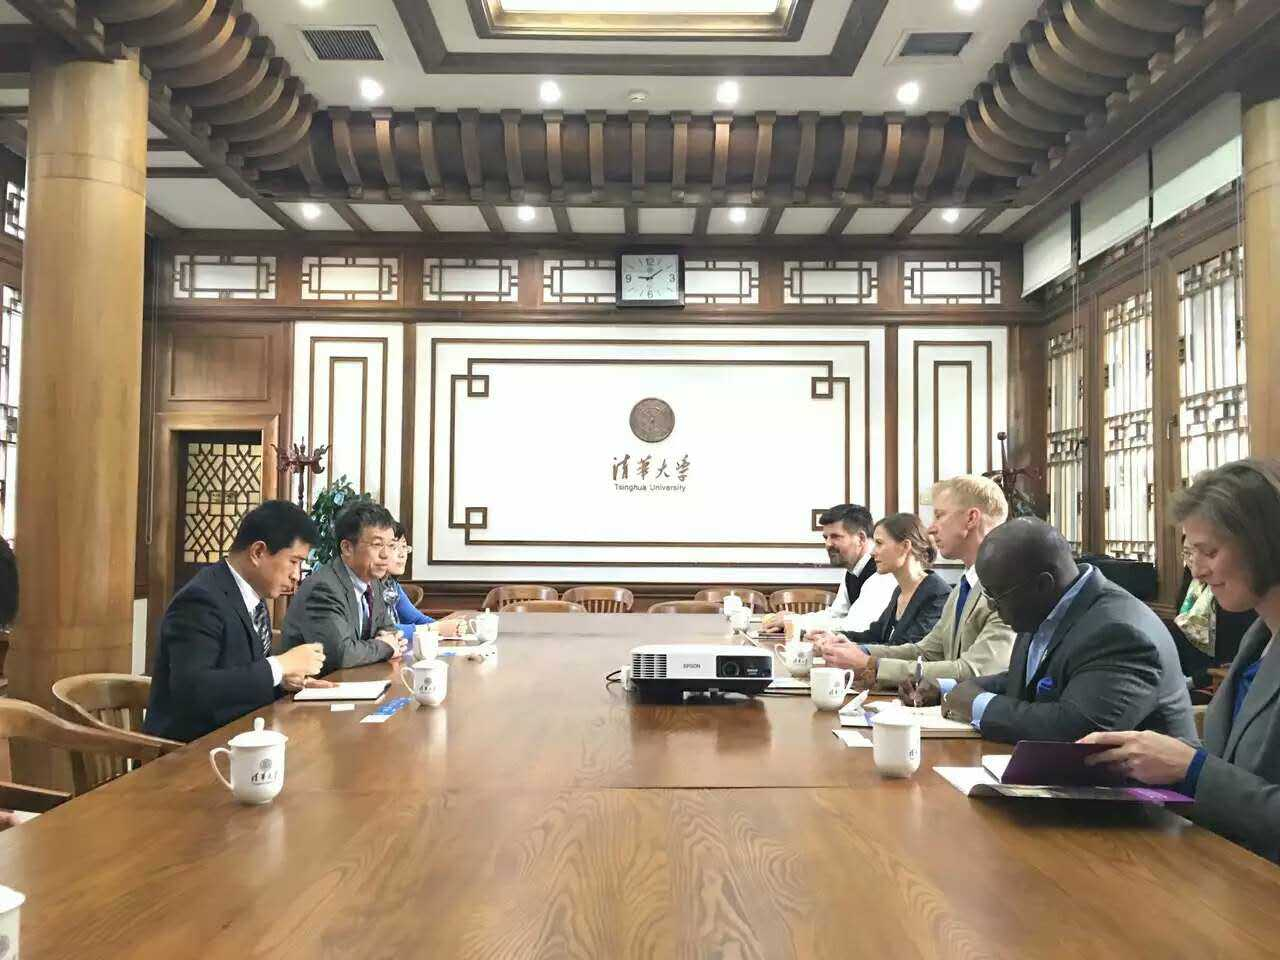 Meeting with top leadership at Tsinghua University